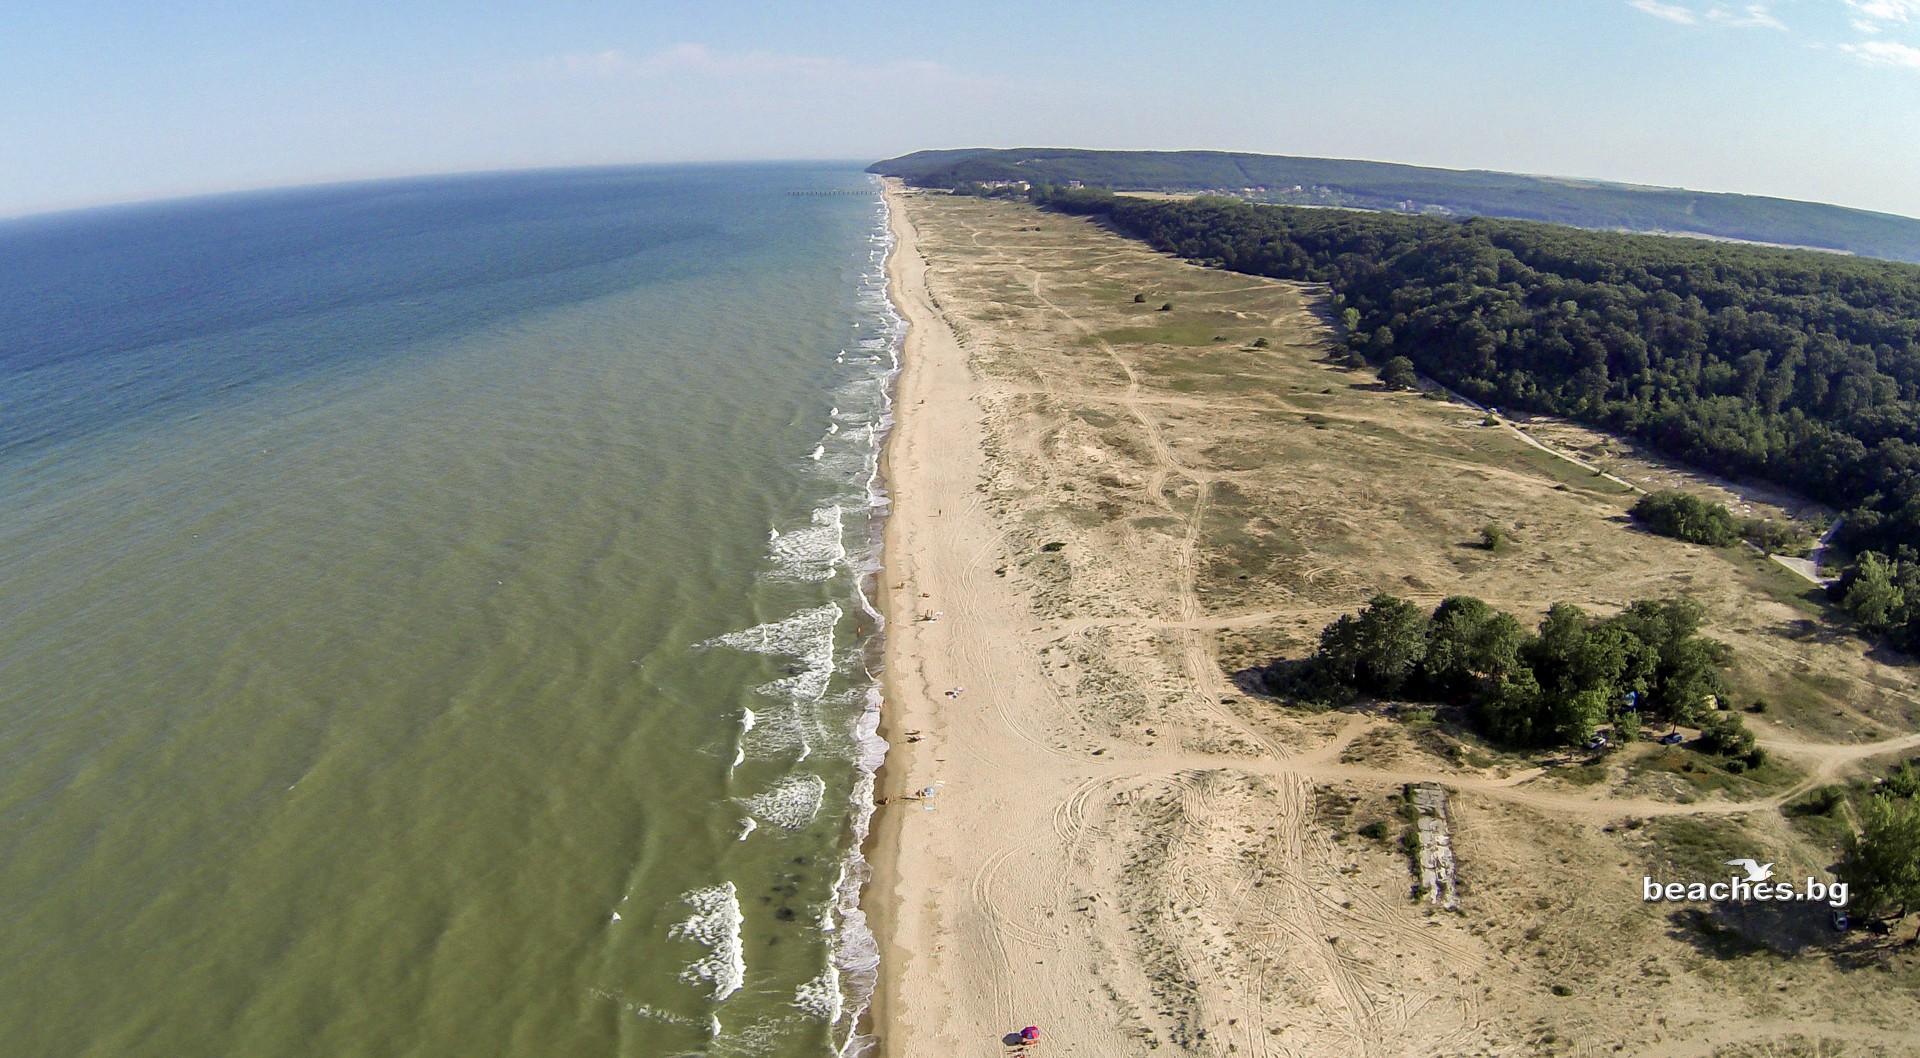 beaches.bg - Долни Чифлик – Плаж Камчийски пясъци, България/ Kamchia sands beach, Bulgaria